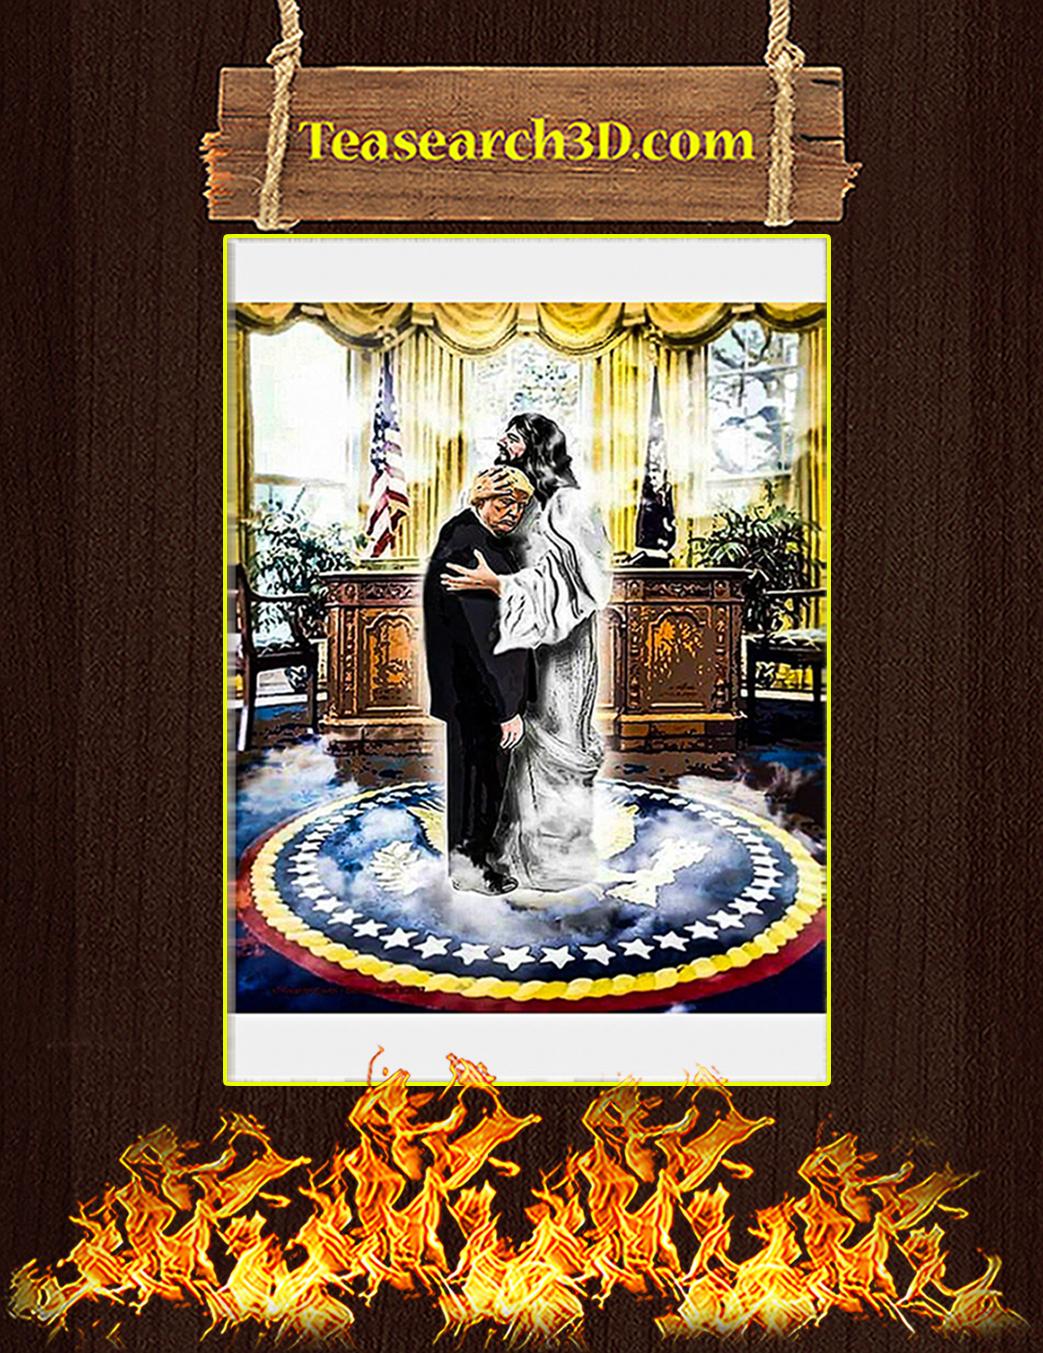 Jesus hugging trump poster A1